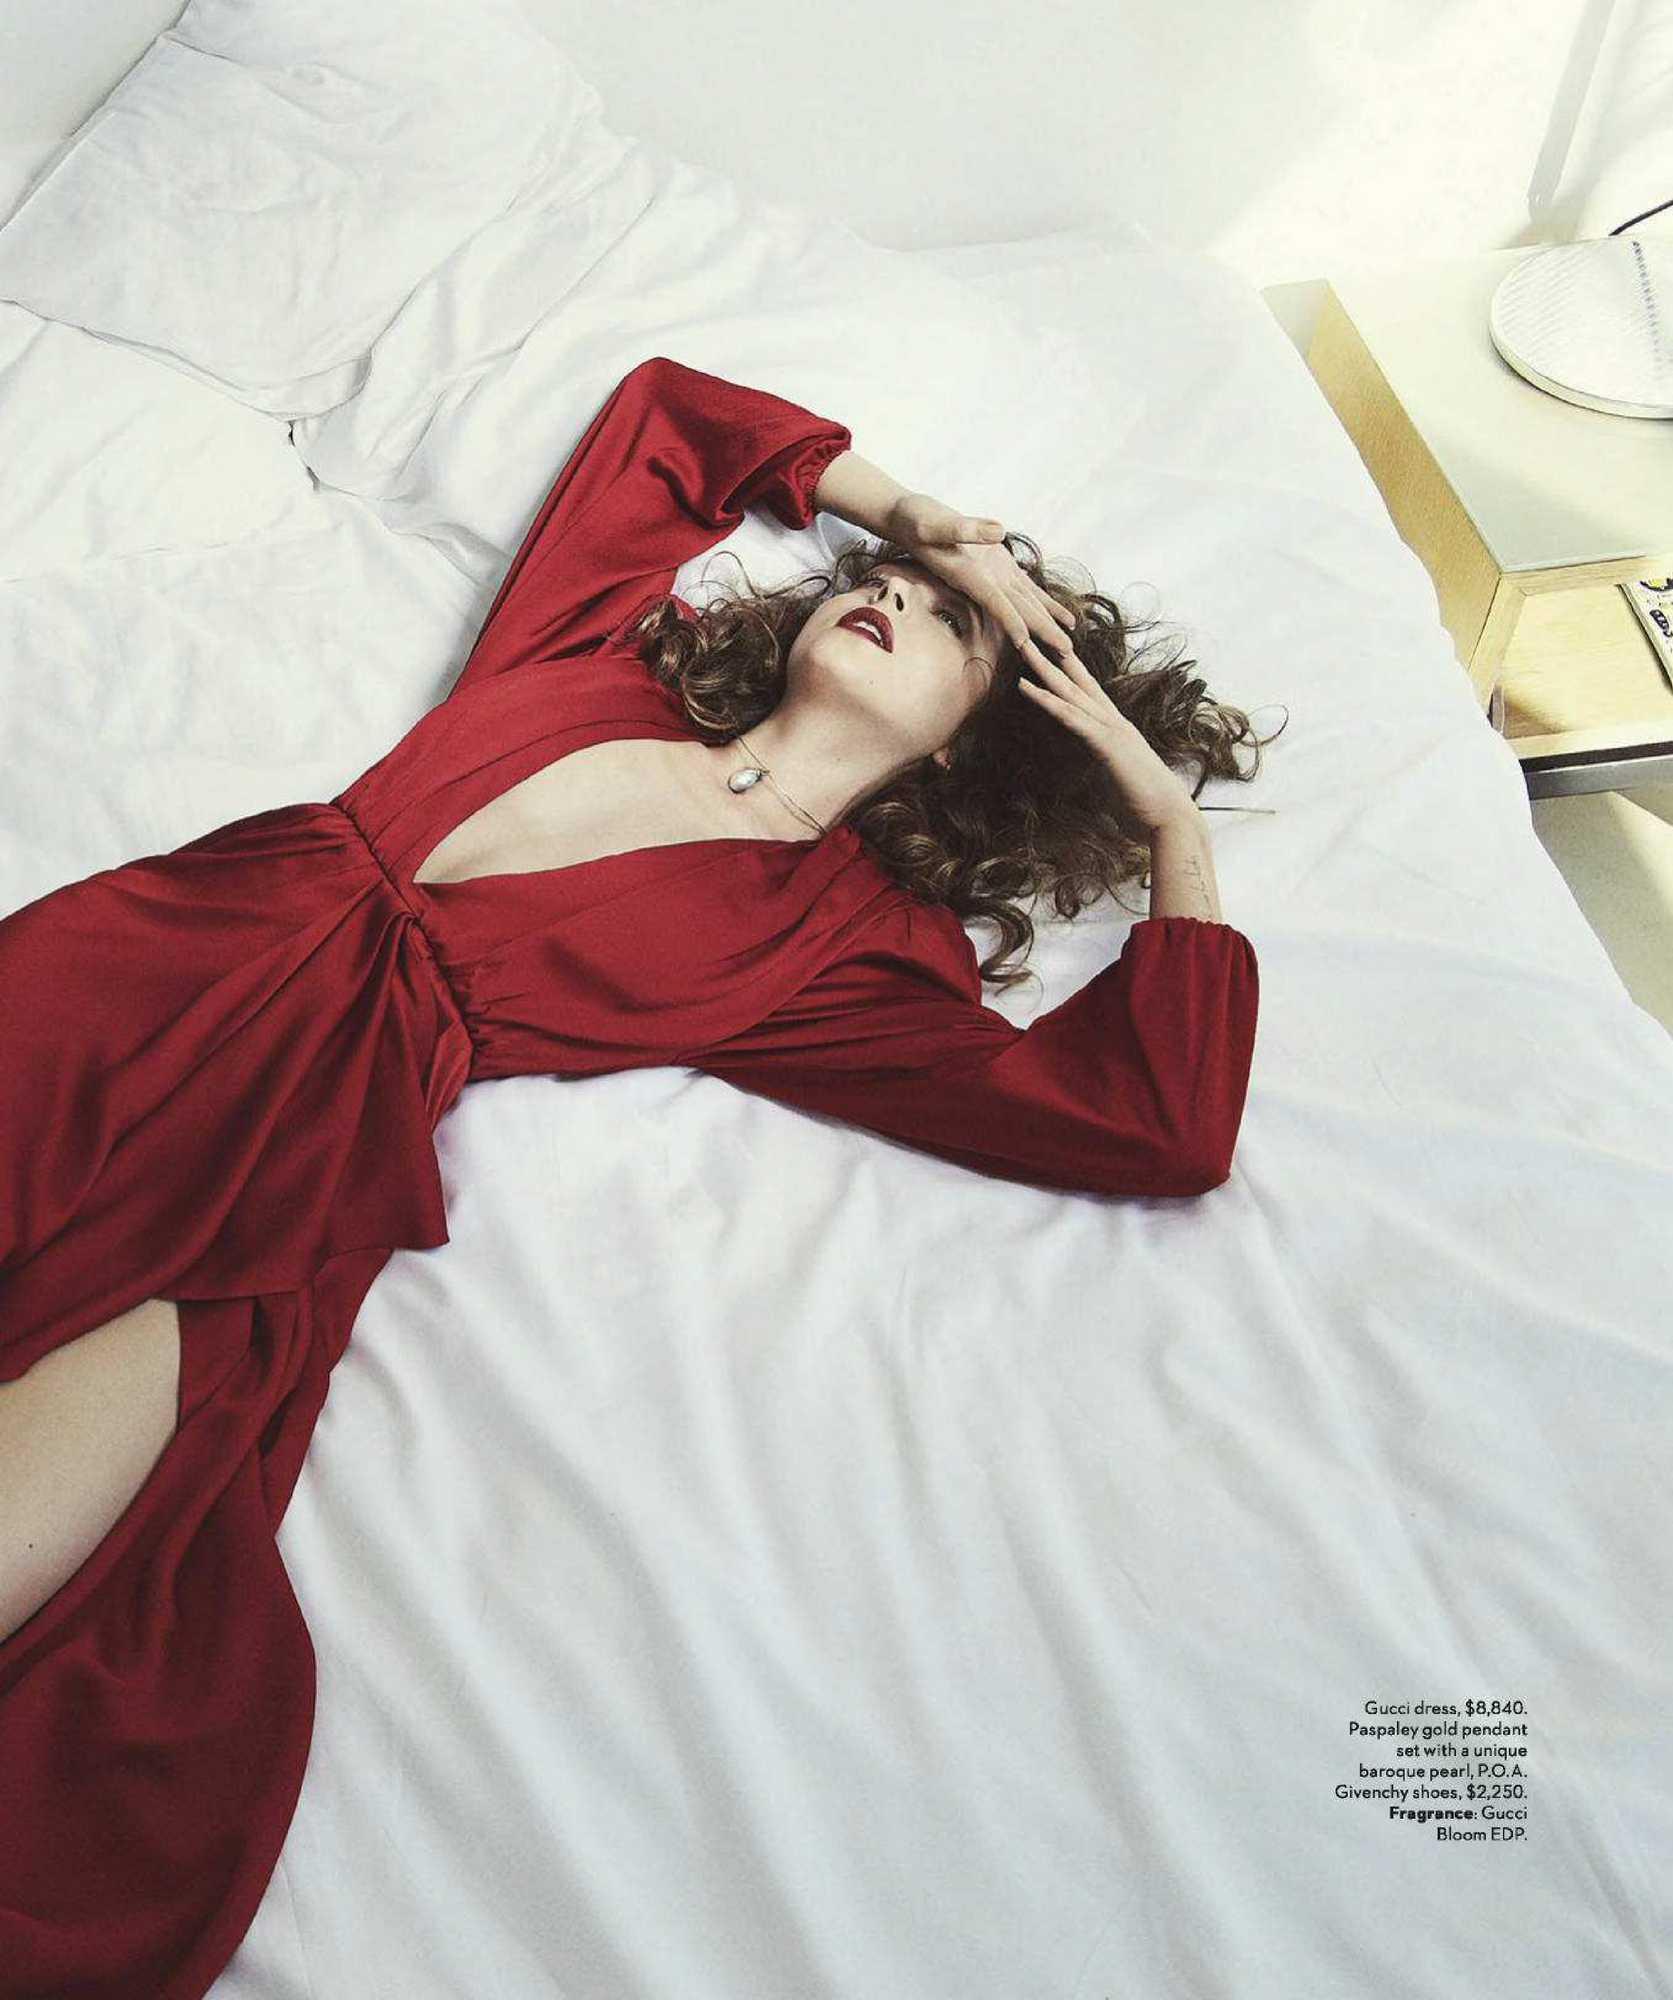 Dakota-Johnson-Emma-Summerton-Photoshoot-for-Vogue-Australia-October-2018ce555b982742854.jpg